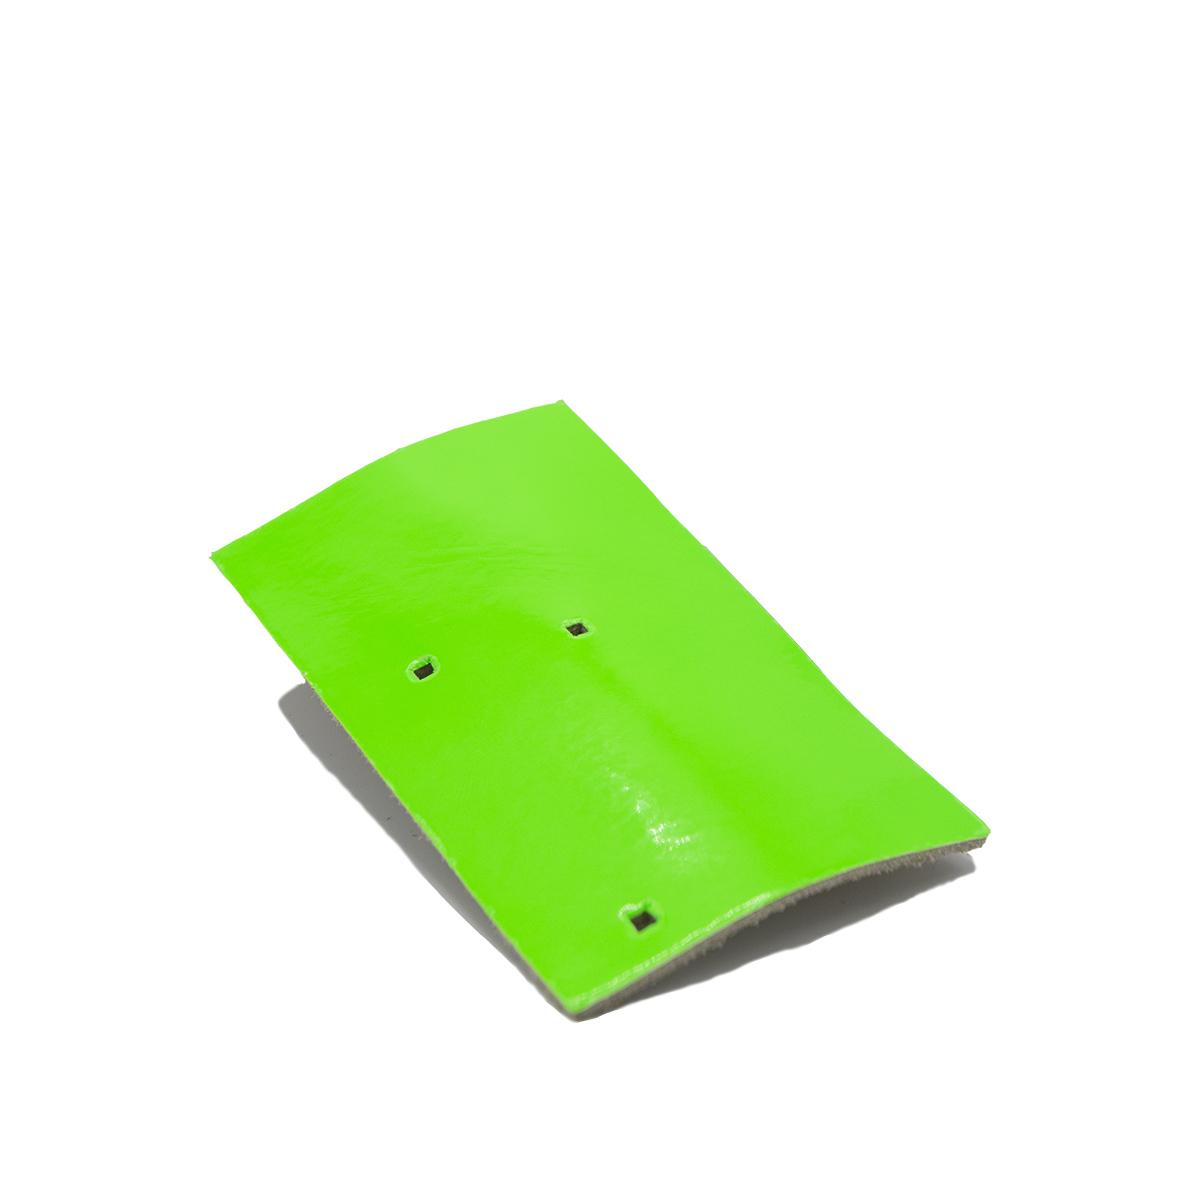 Patent green